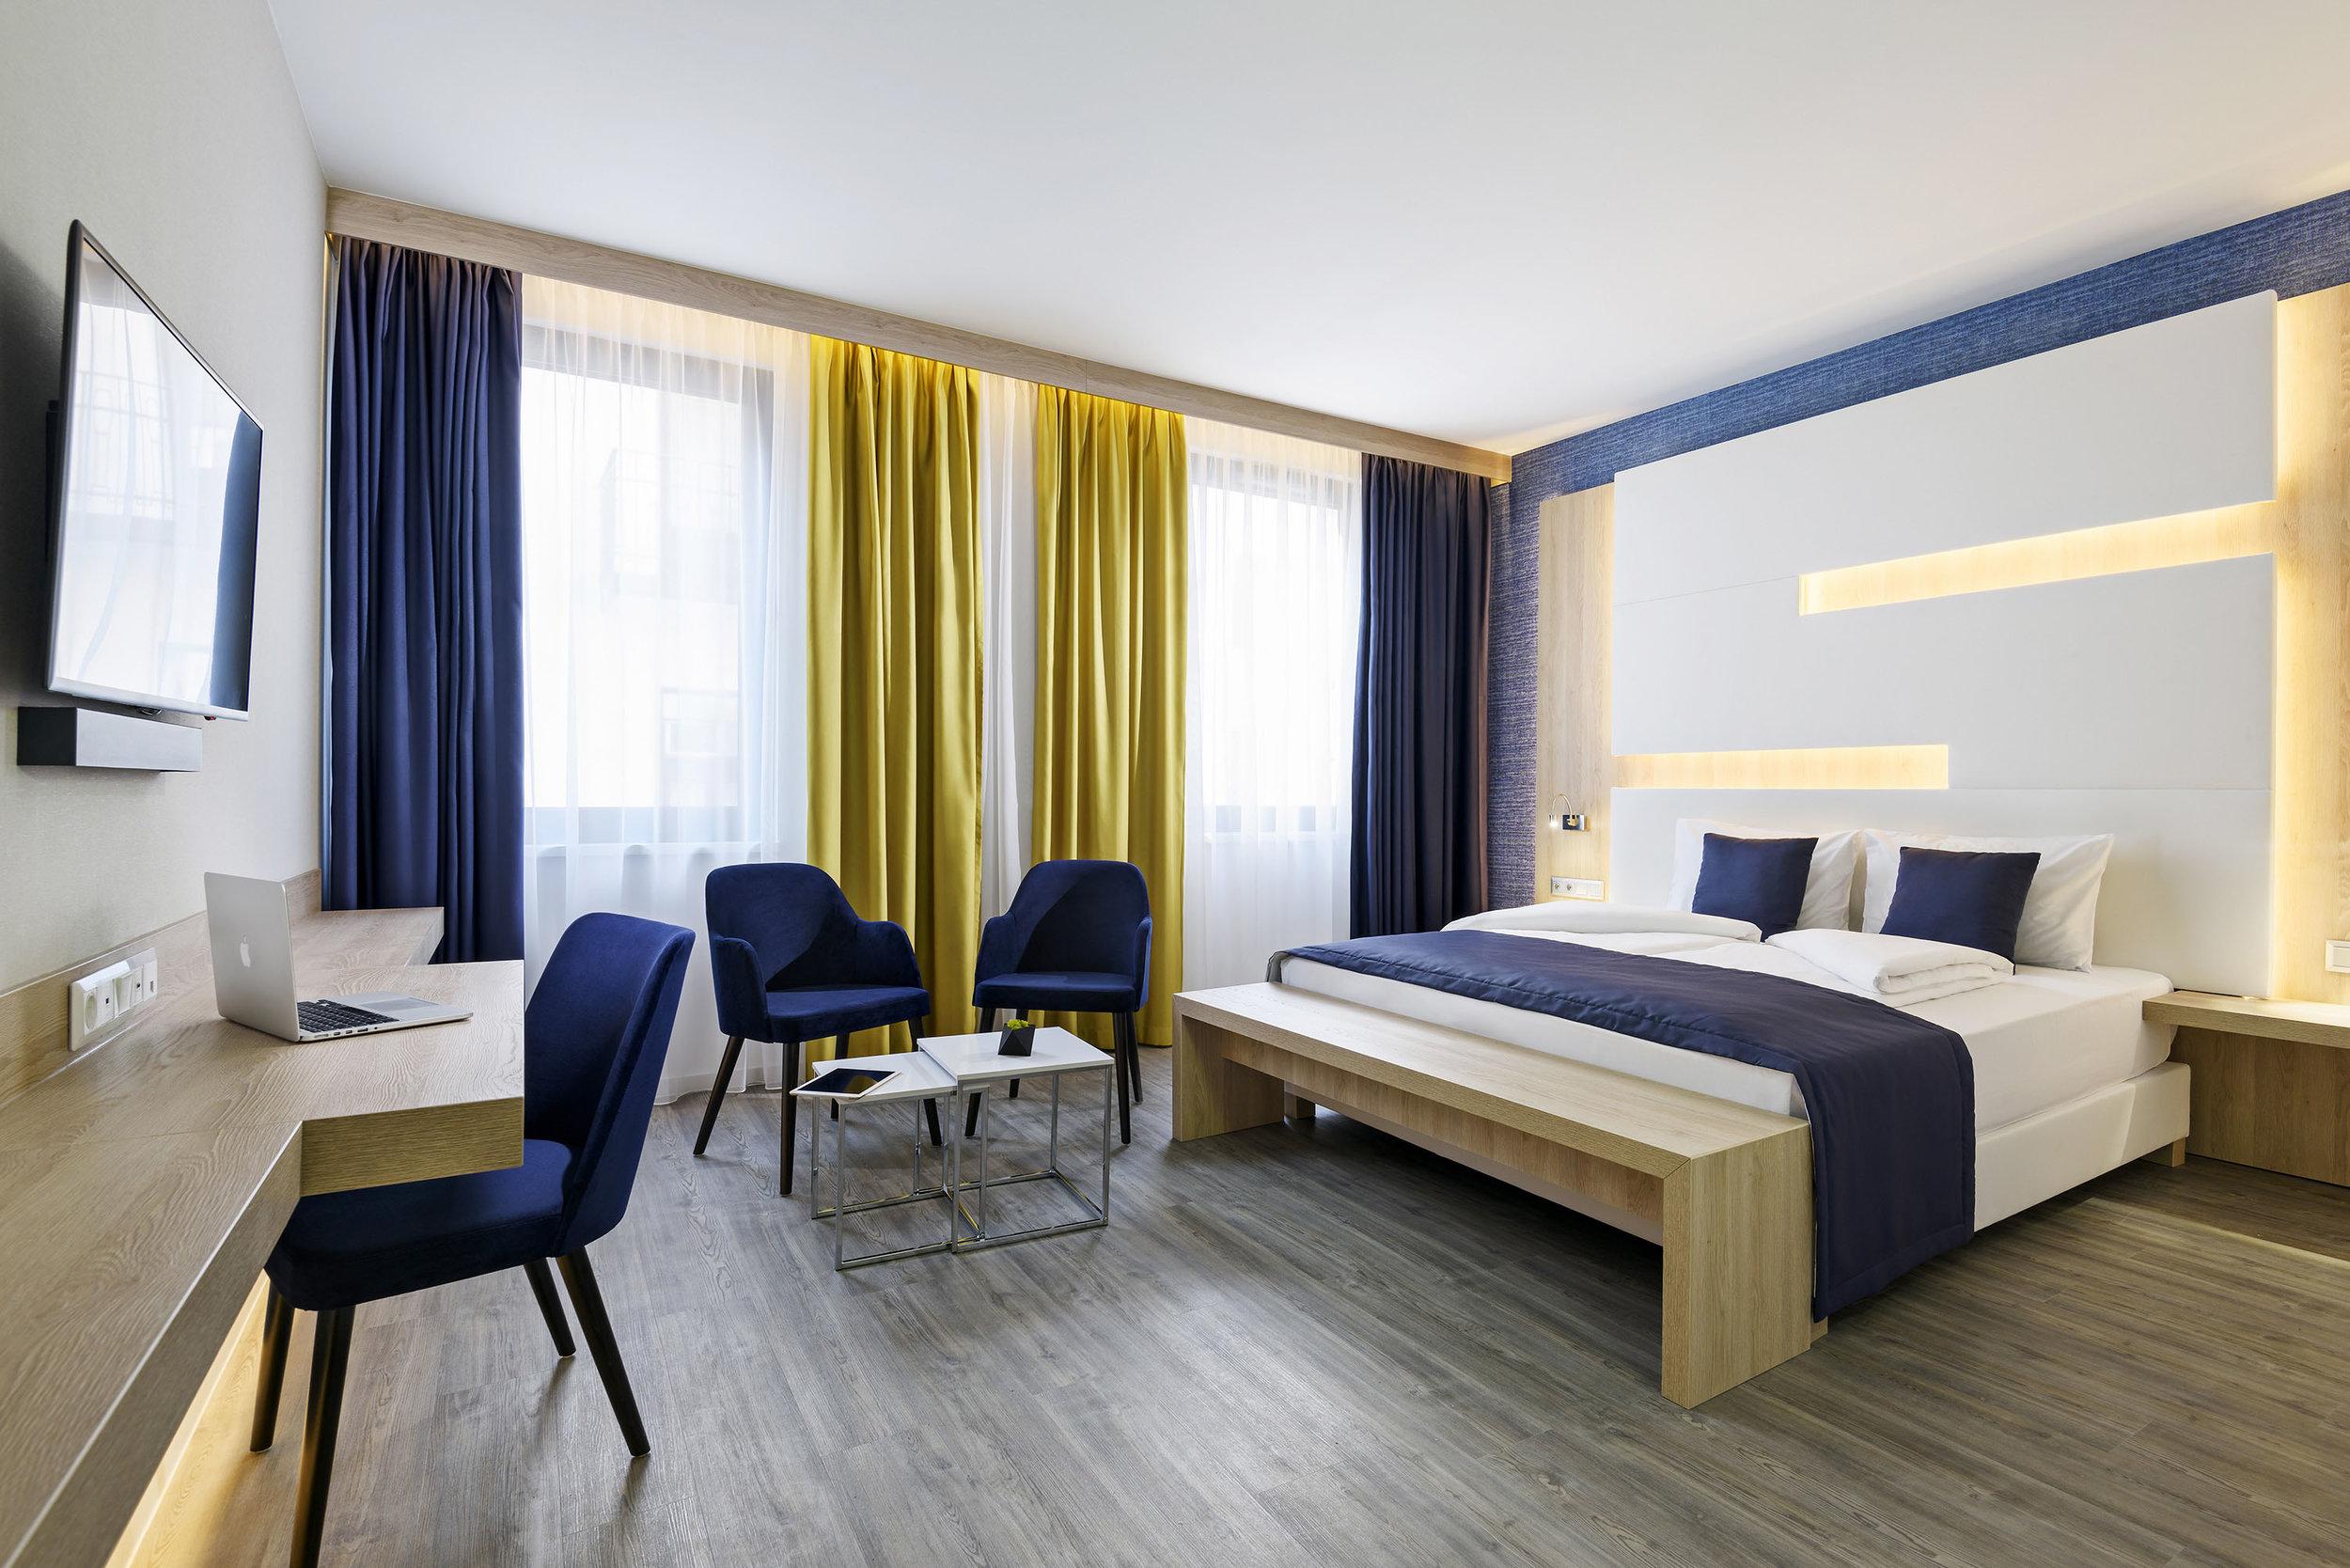 KVI_Hotel_307_01_mod.jpg